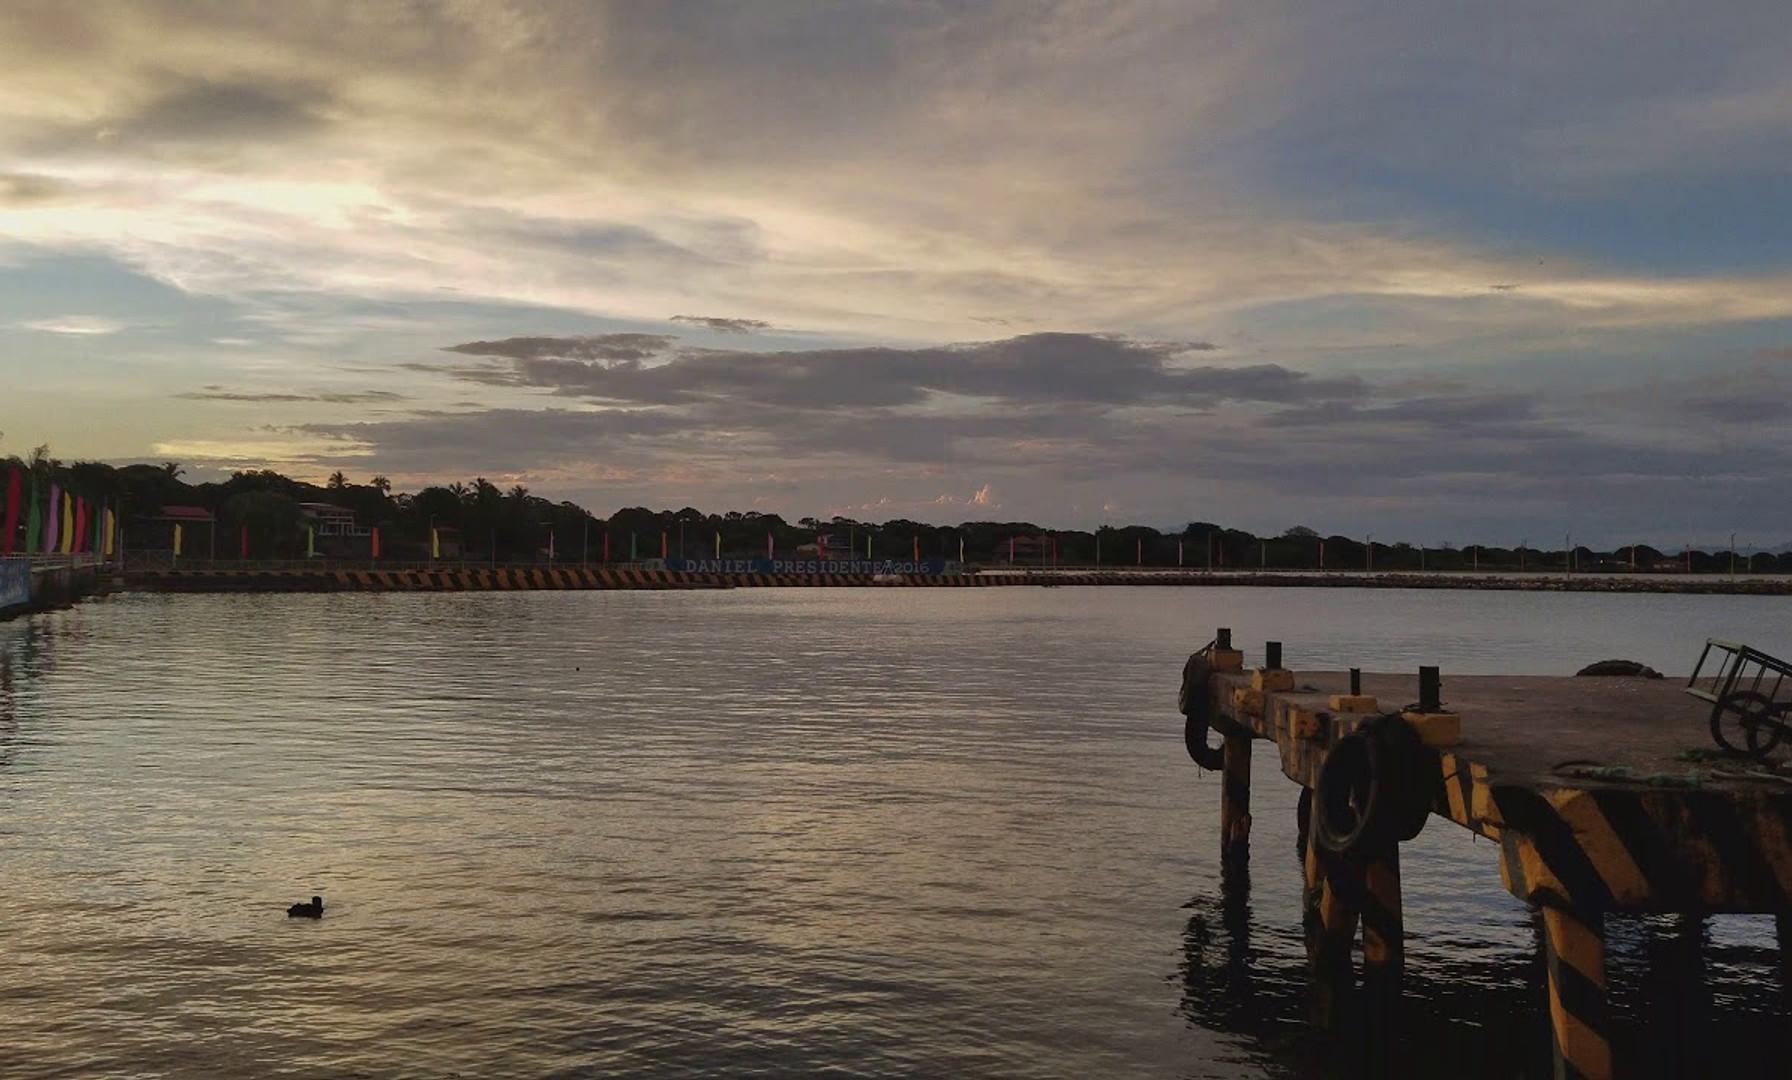 Sunset Sounds on the the Pier at Playa San Jorge; San Jorge/Rivas, Nicaragua